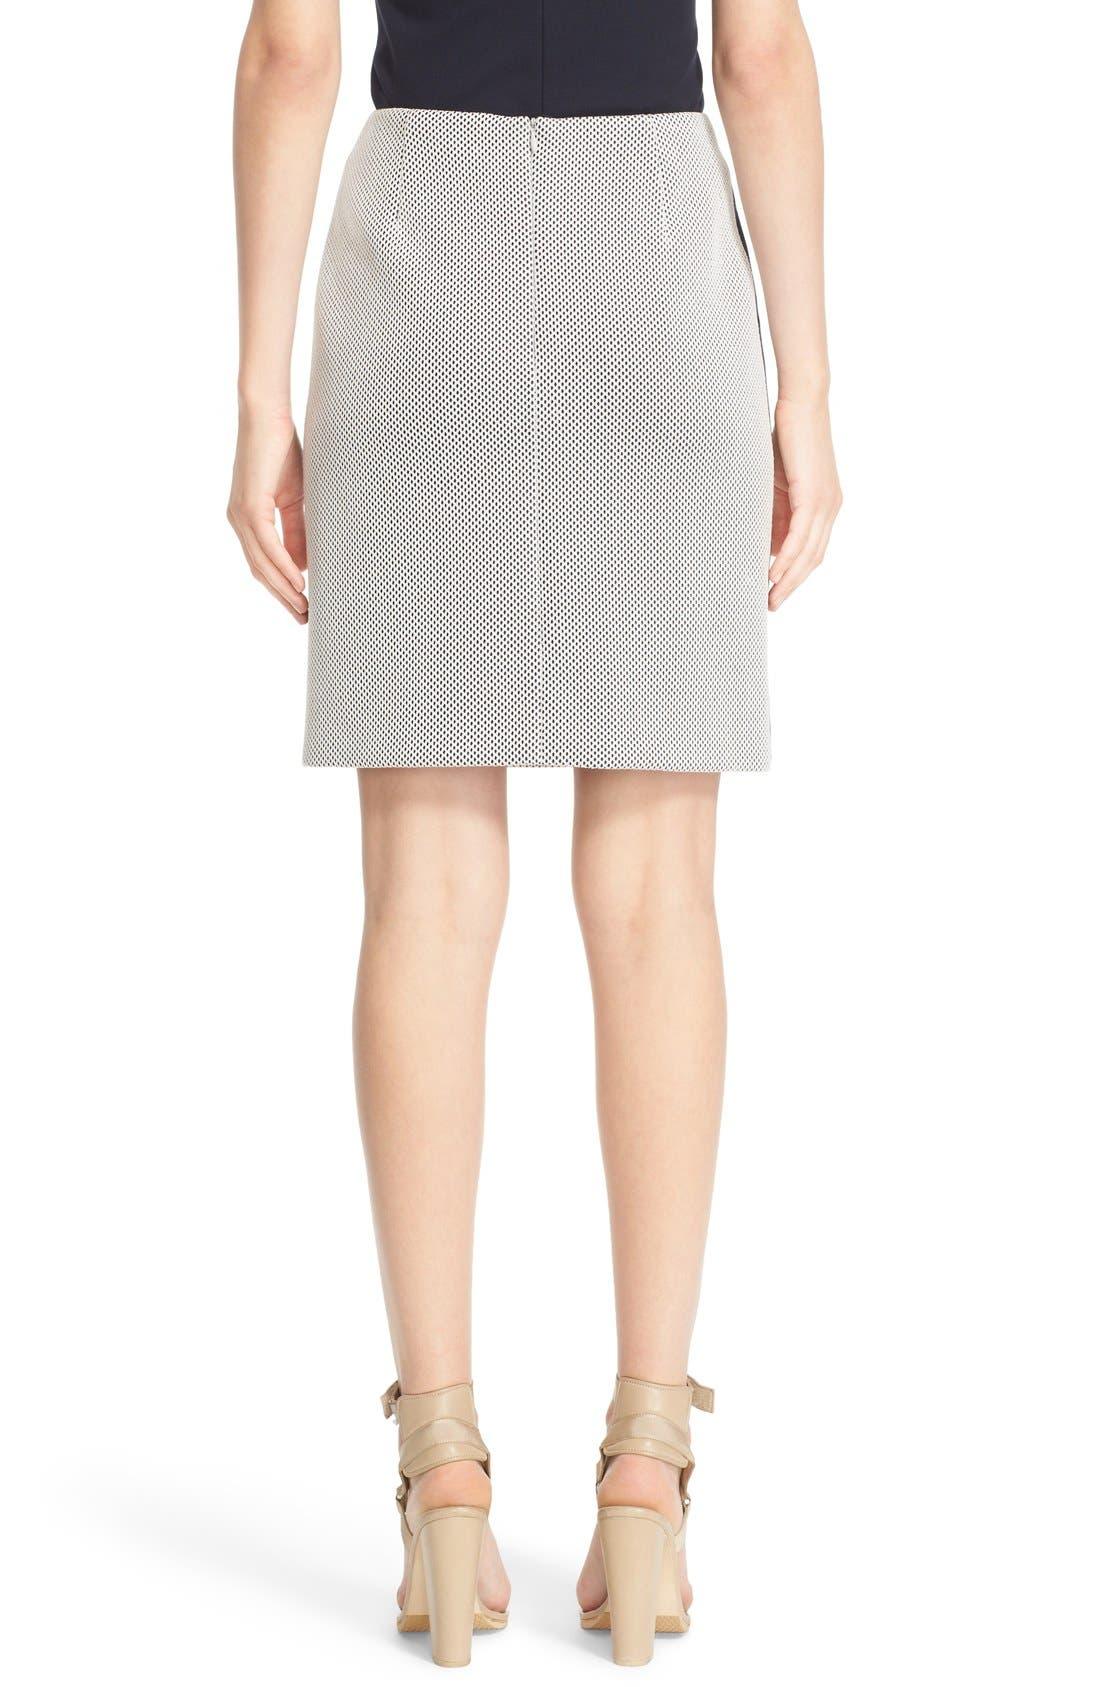 AKRIS PUNTO, Side Stripe Mesh Pencil Skirt, Alternate thumbnail 3, color, 900